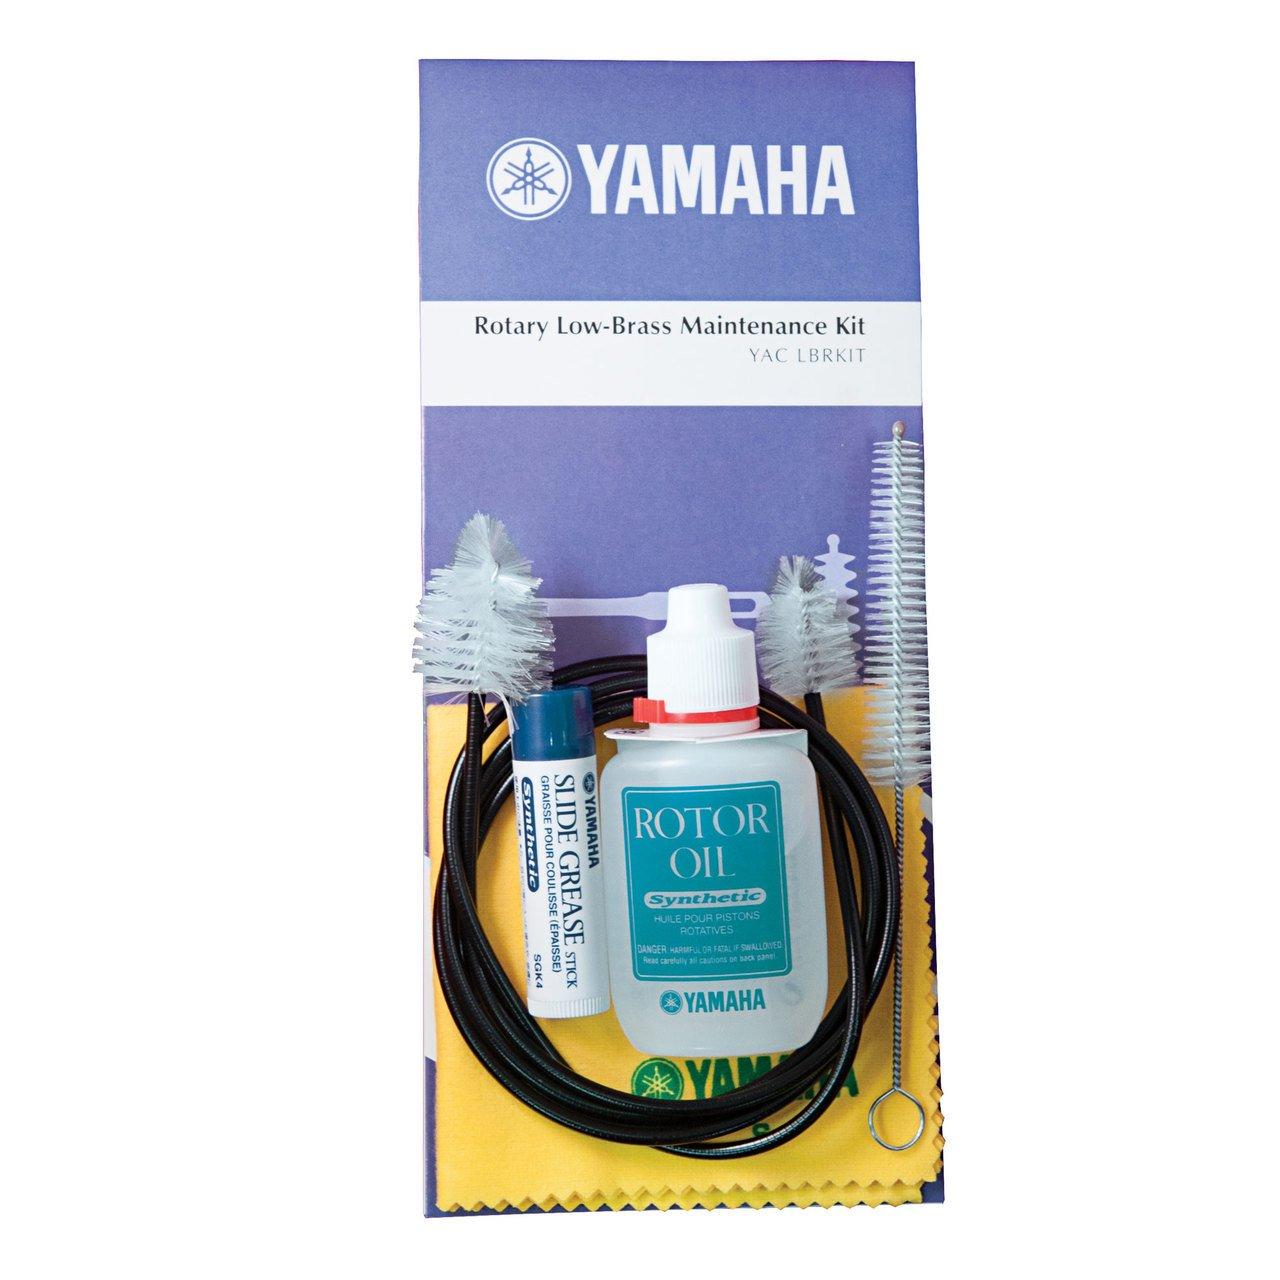 Yamaha YACLBRKIT Low Brass Rotary Valve Maintenance Kit